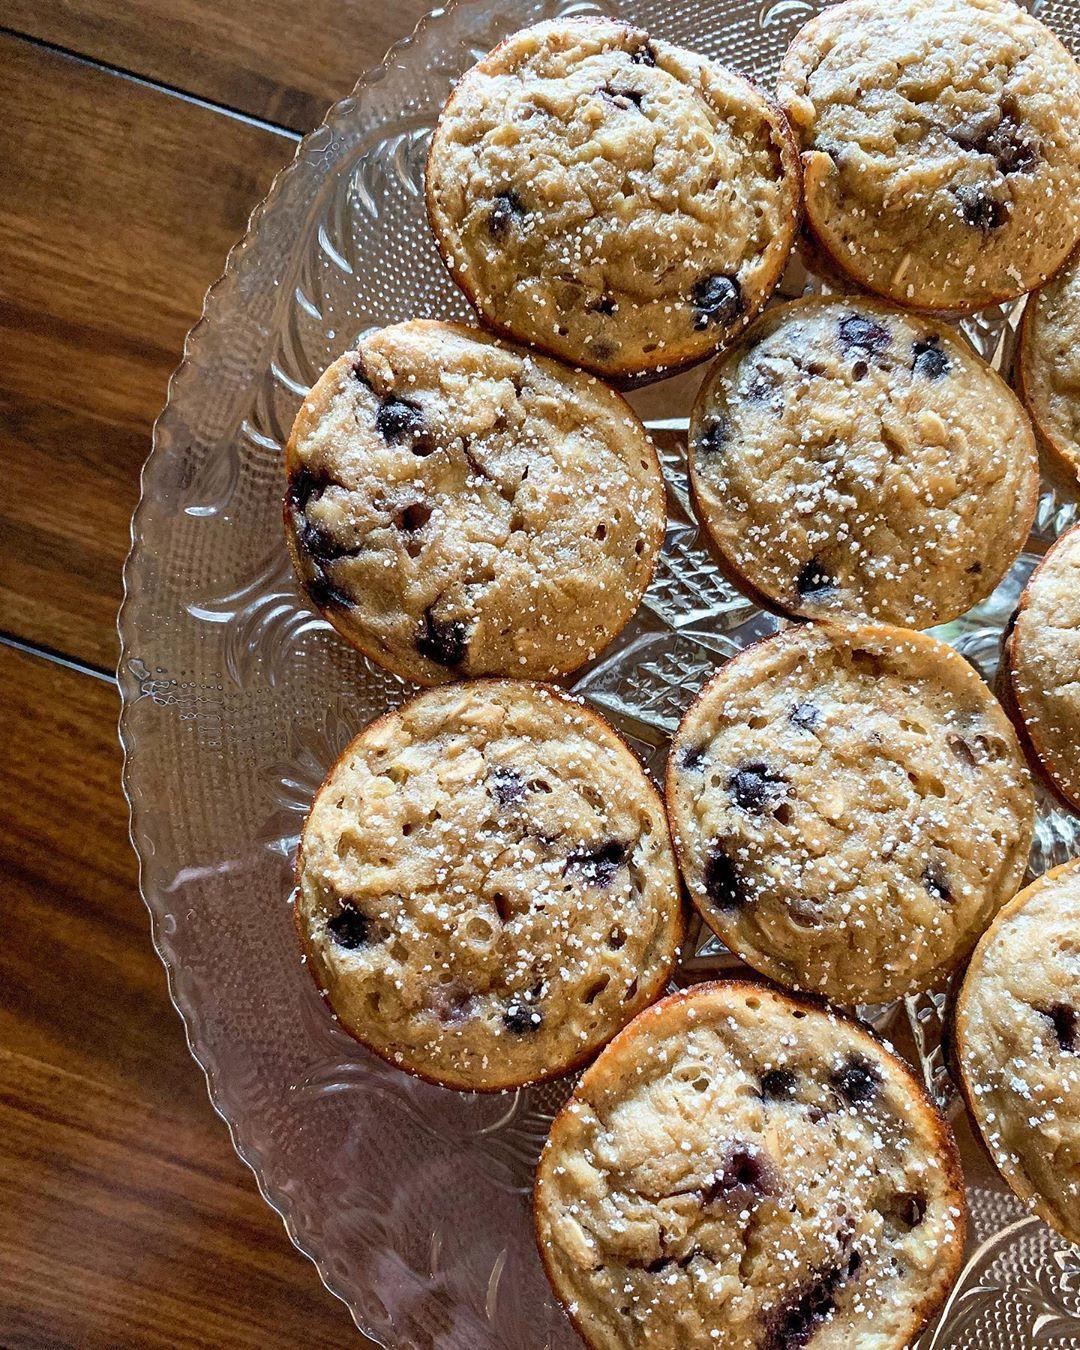 Banana blueberry muffins 1sp 1 cup kodiak cakes